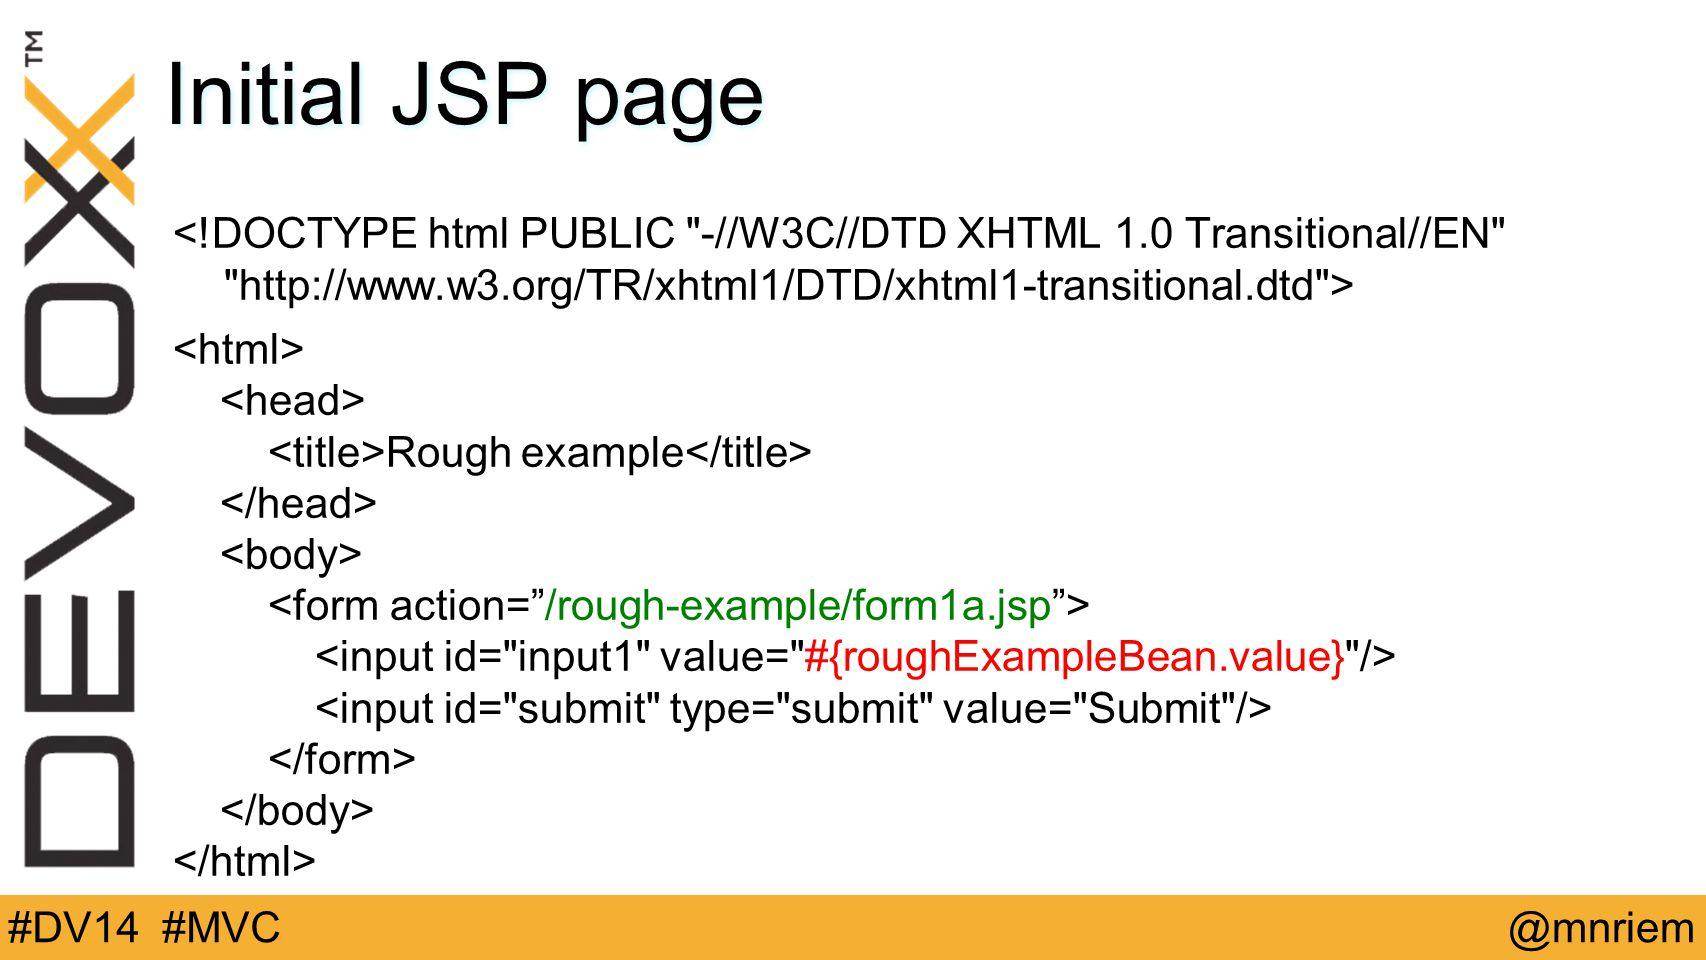 @mnriem#DV14 #MVC Initial JSP page Rough example